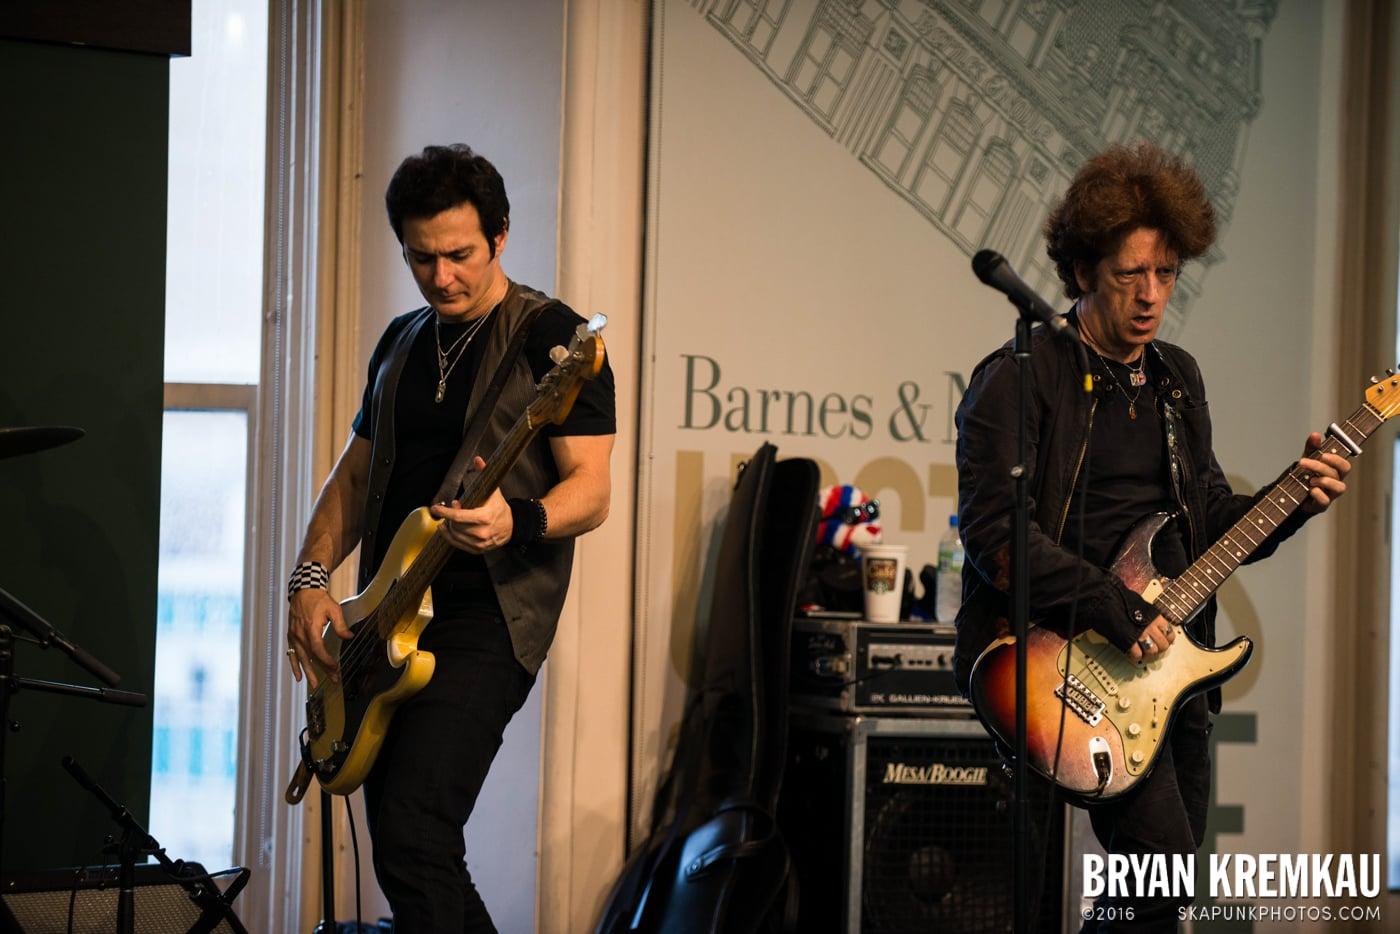 Willie Nile @ Barnes & Noble: Union Square, NYC - 6.25.13 (16)